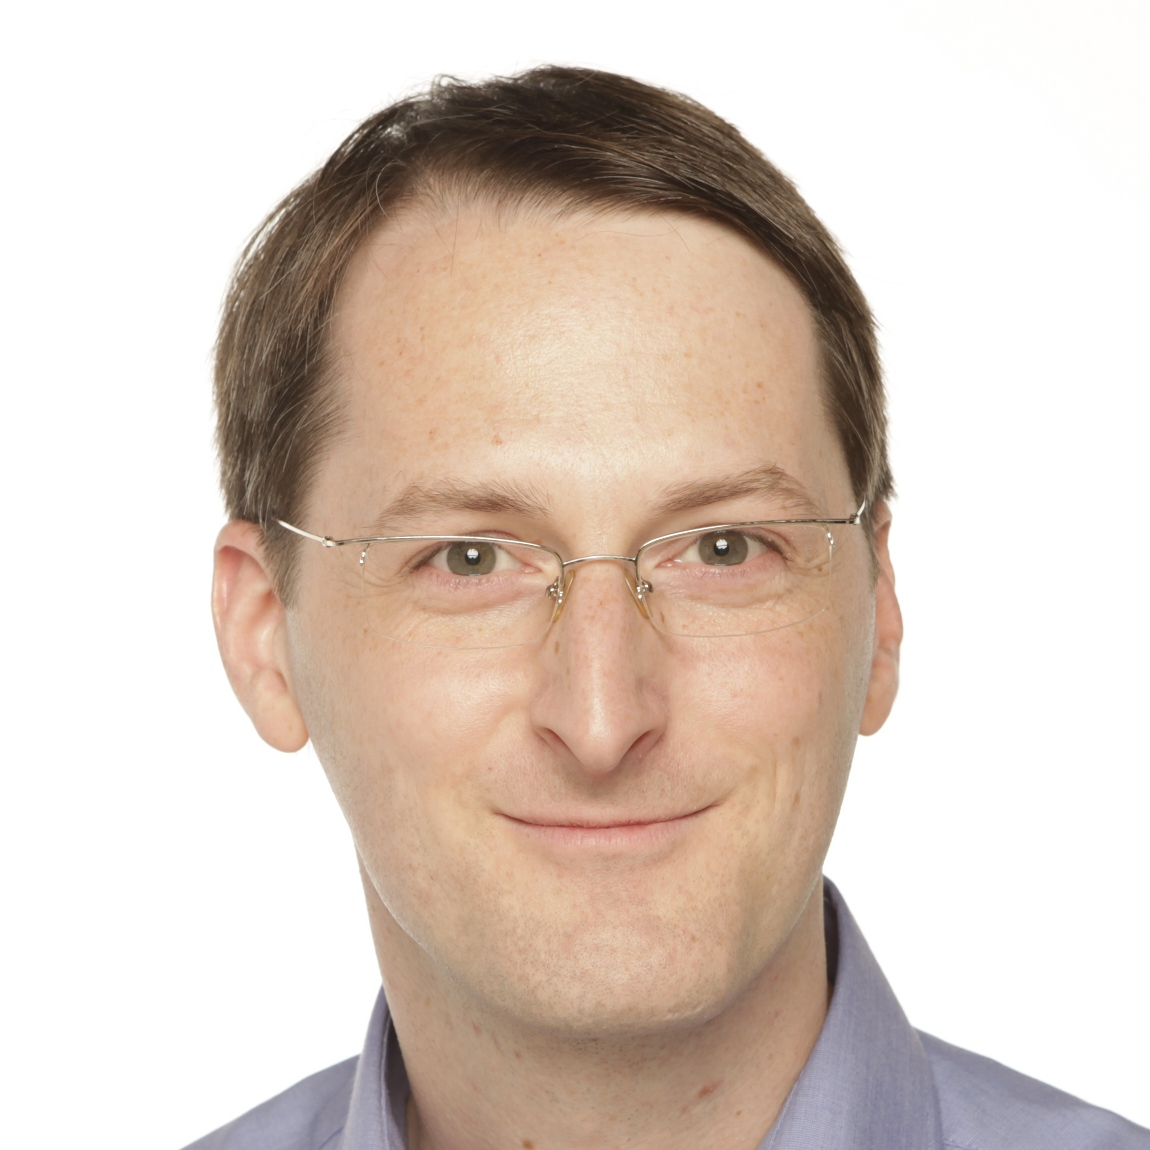 Nils T. Siebel